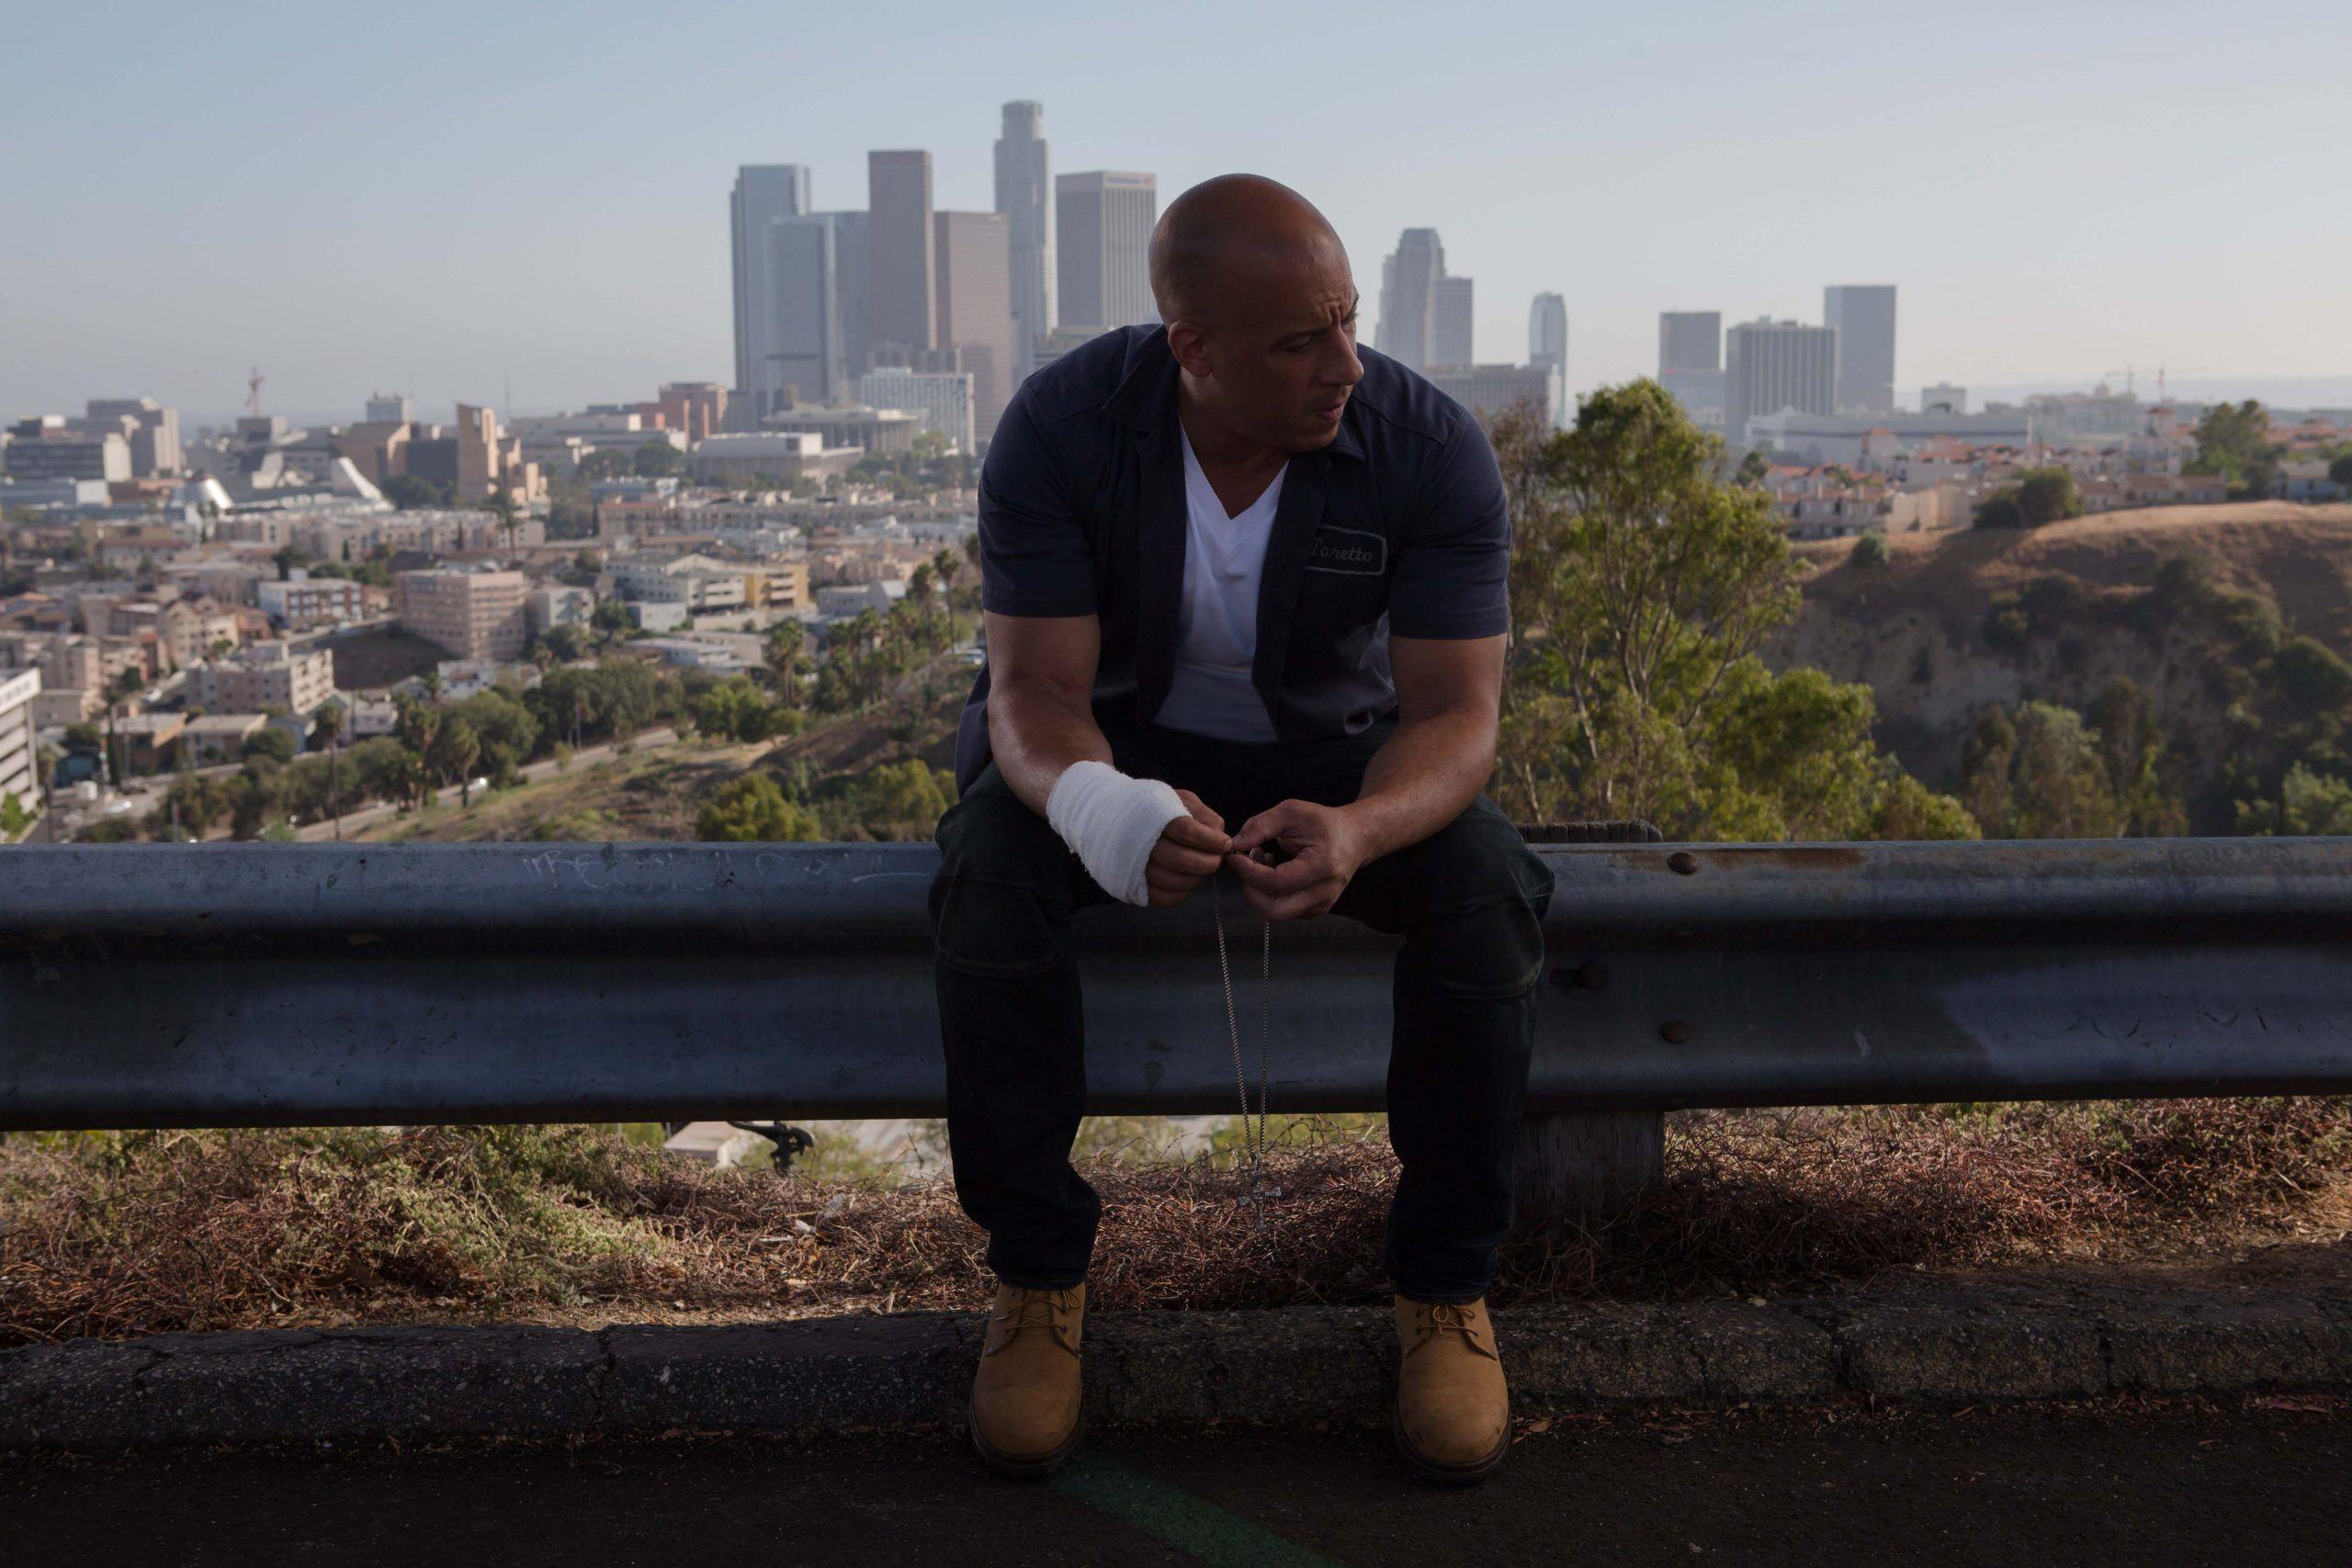 Fast and Furious 7: trama, trailer e cast dell'ultimo film con Paul Walker